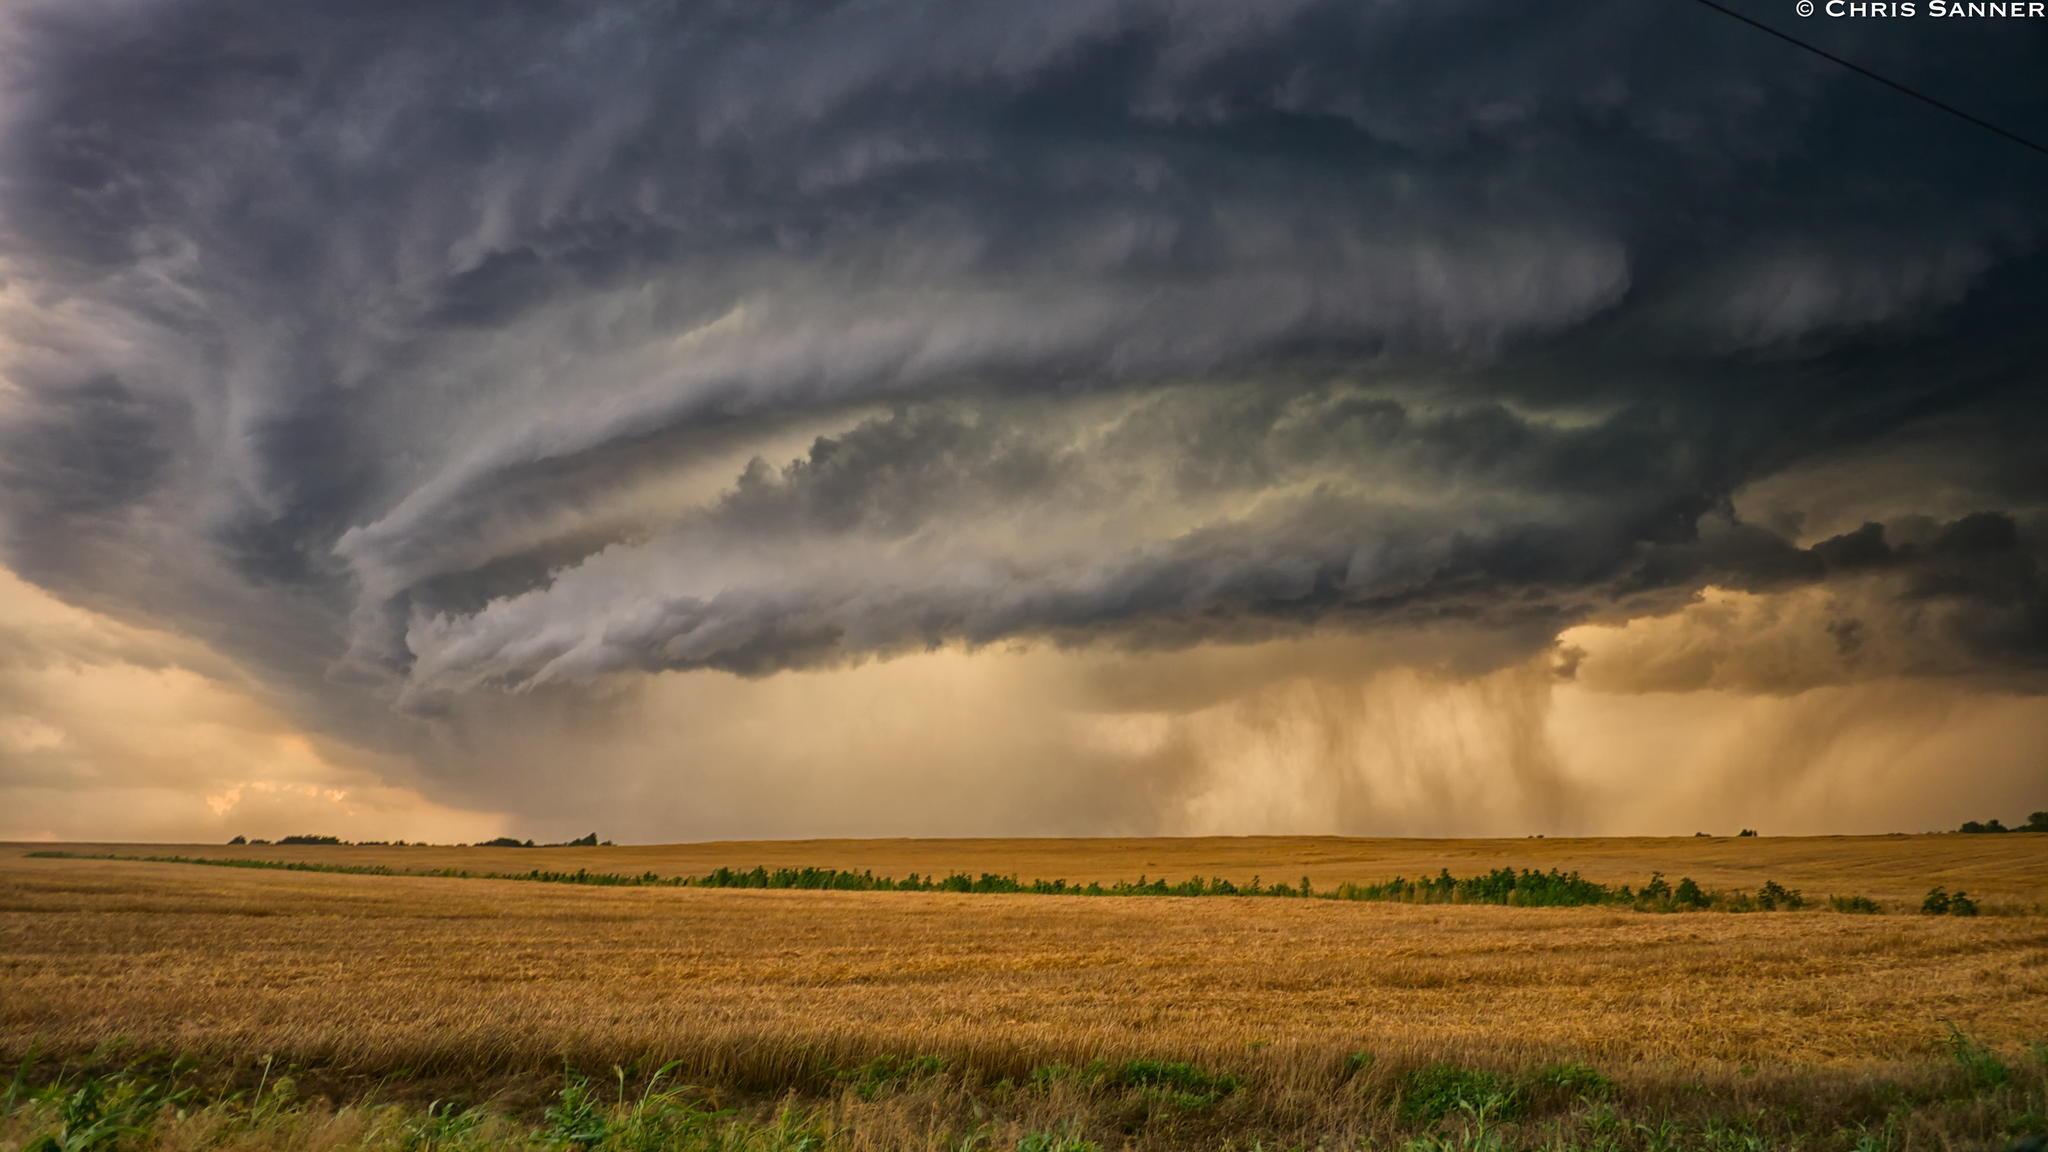 thunderhead clouds wallpaper - photo #48